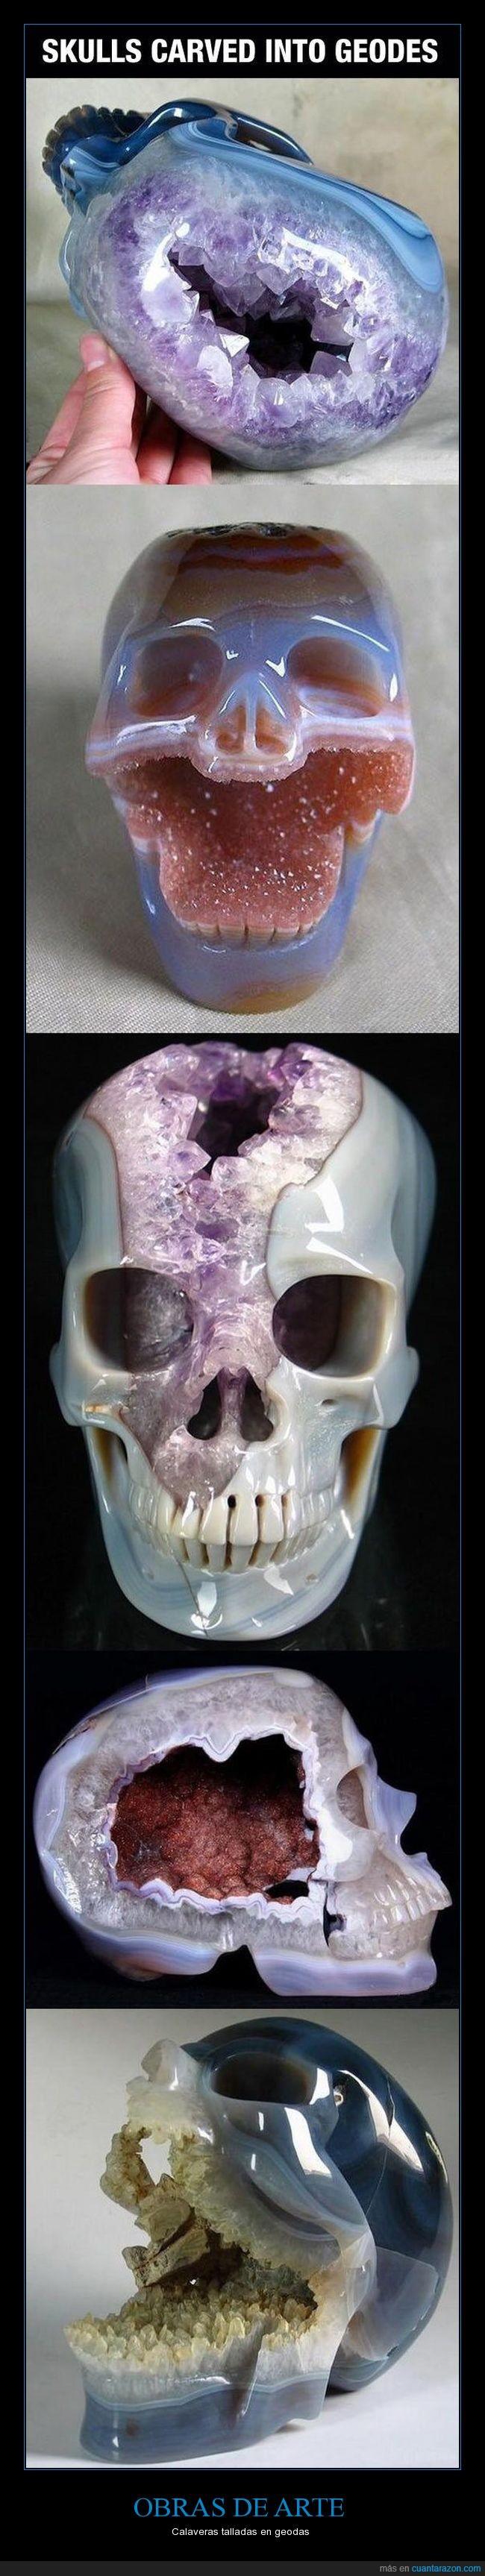 arte,cráneo,geoda